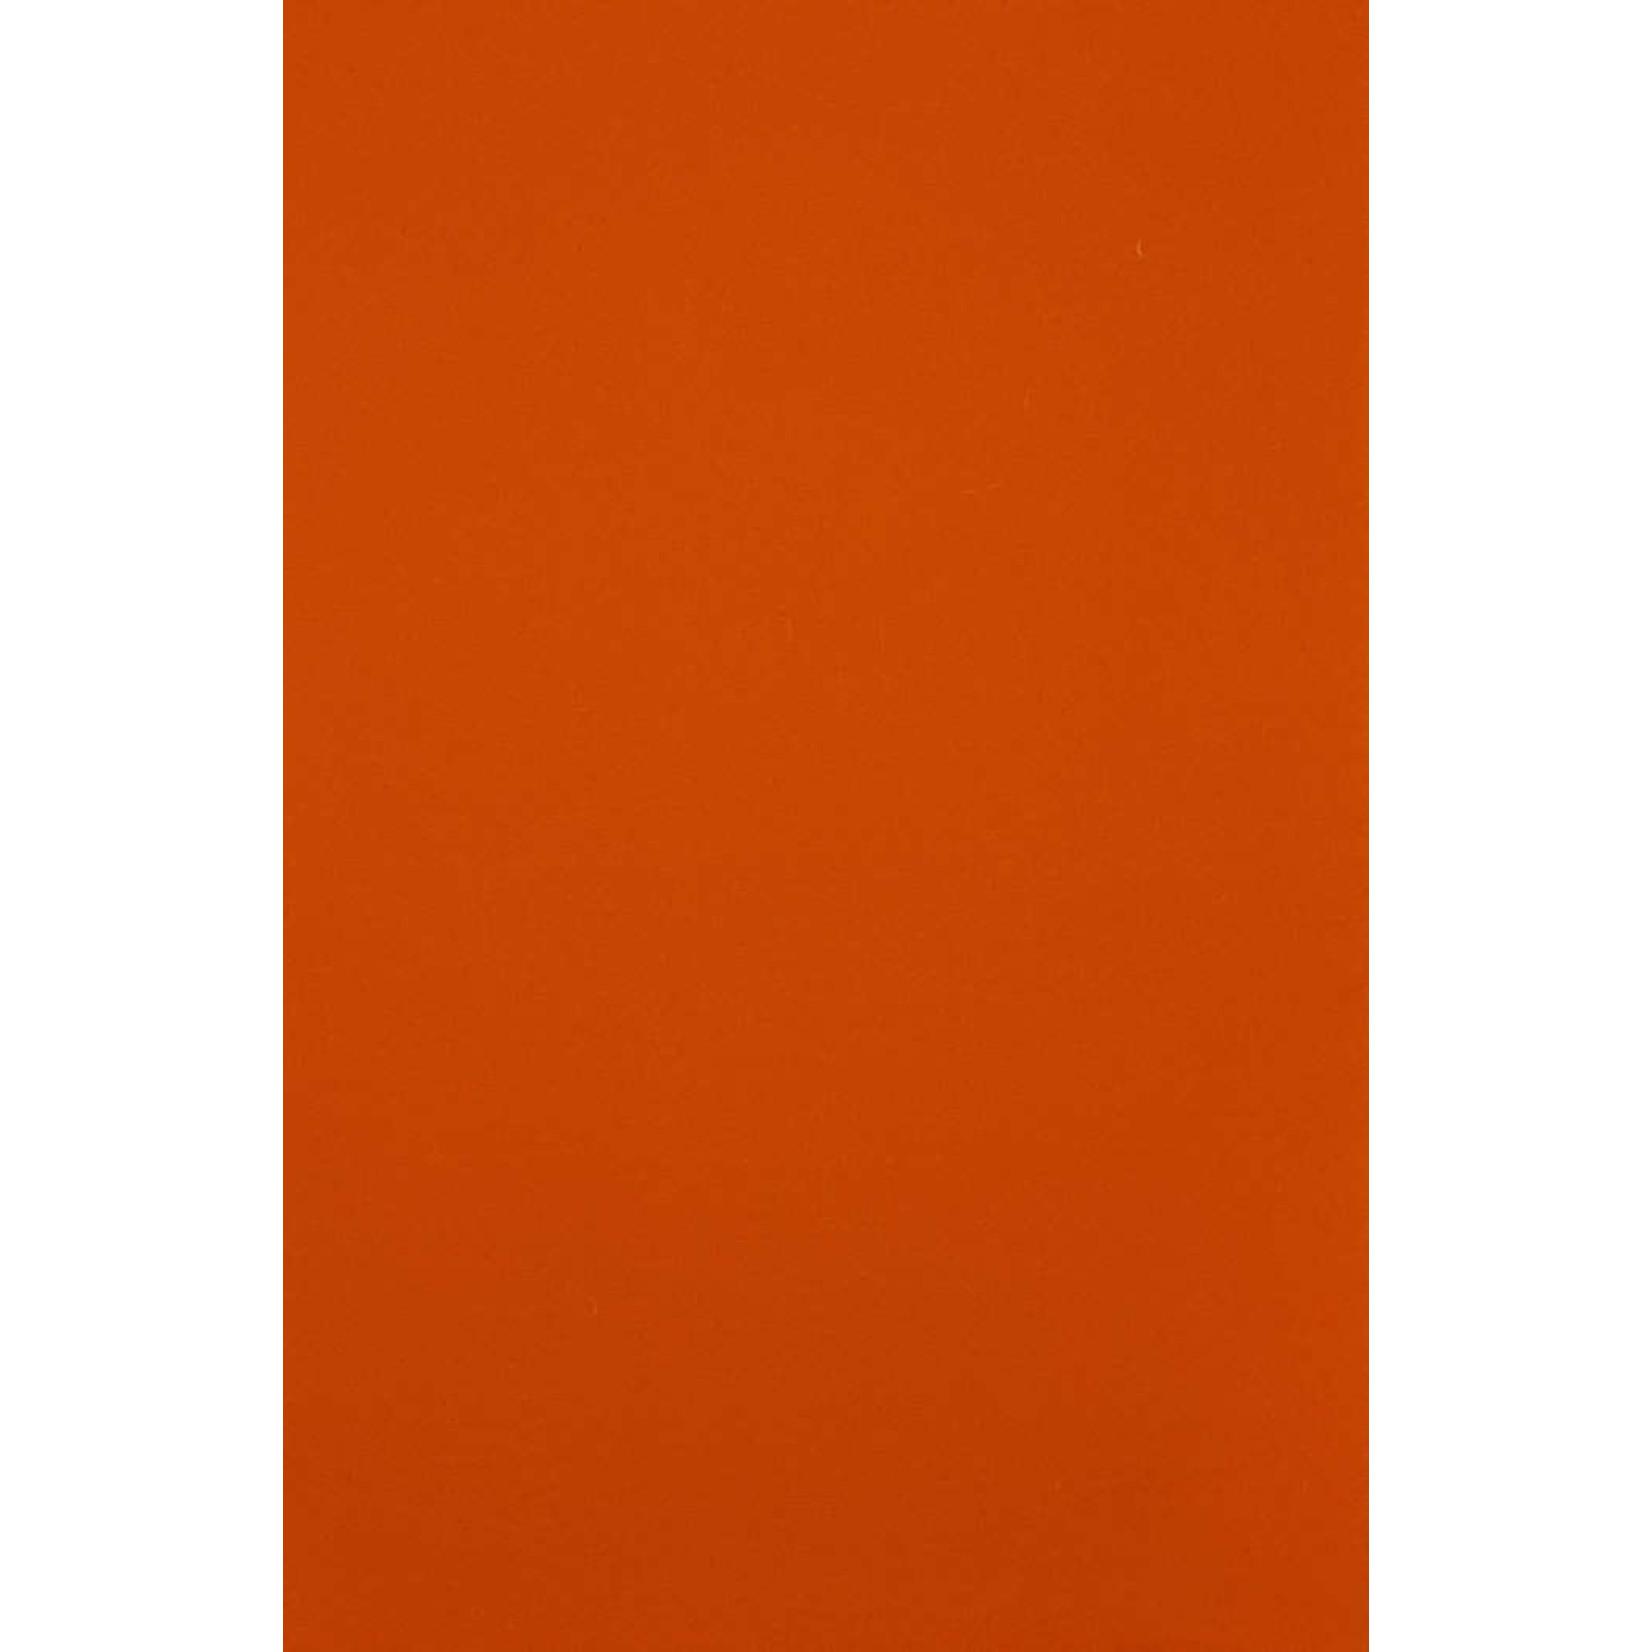 HollandFelt Wolvilt - lapje 20 x 30 cm. - kleur 04  Lichtoranje - zuiver scheerwol- 1 mm. dik